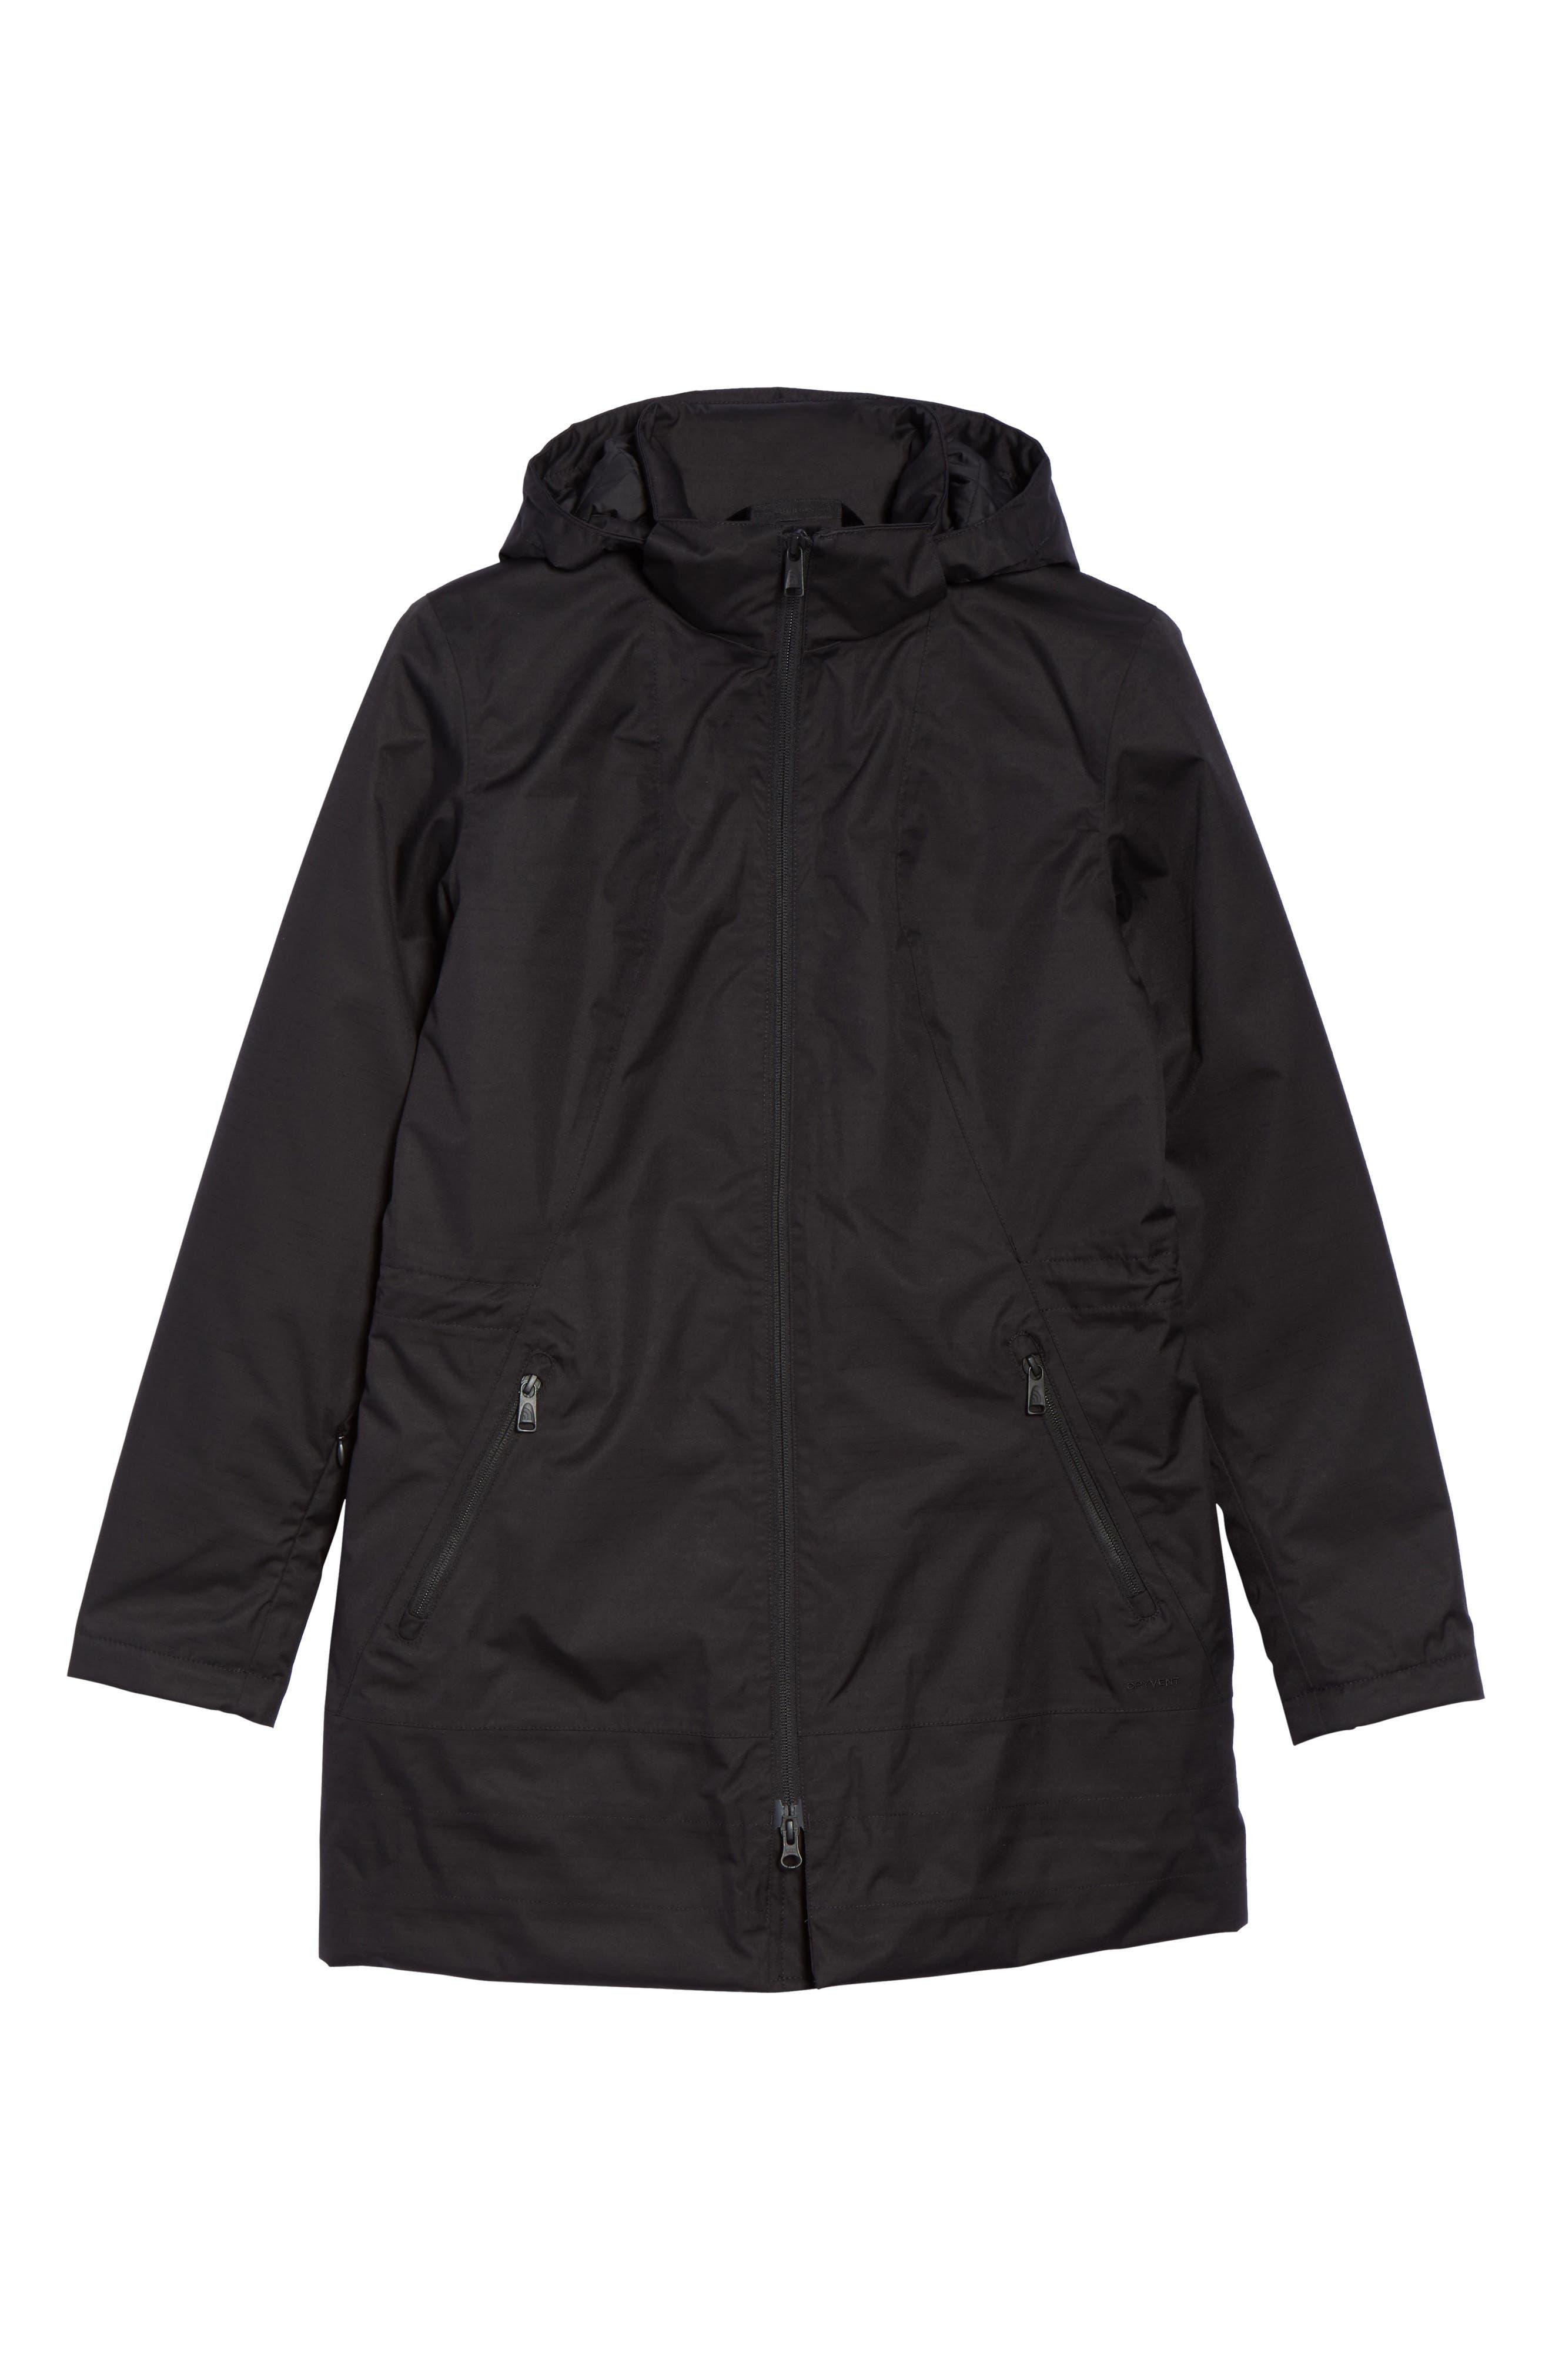 'Ancha' Hooded Waterproof Parka,                         Main,                         color, Tnf Black